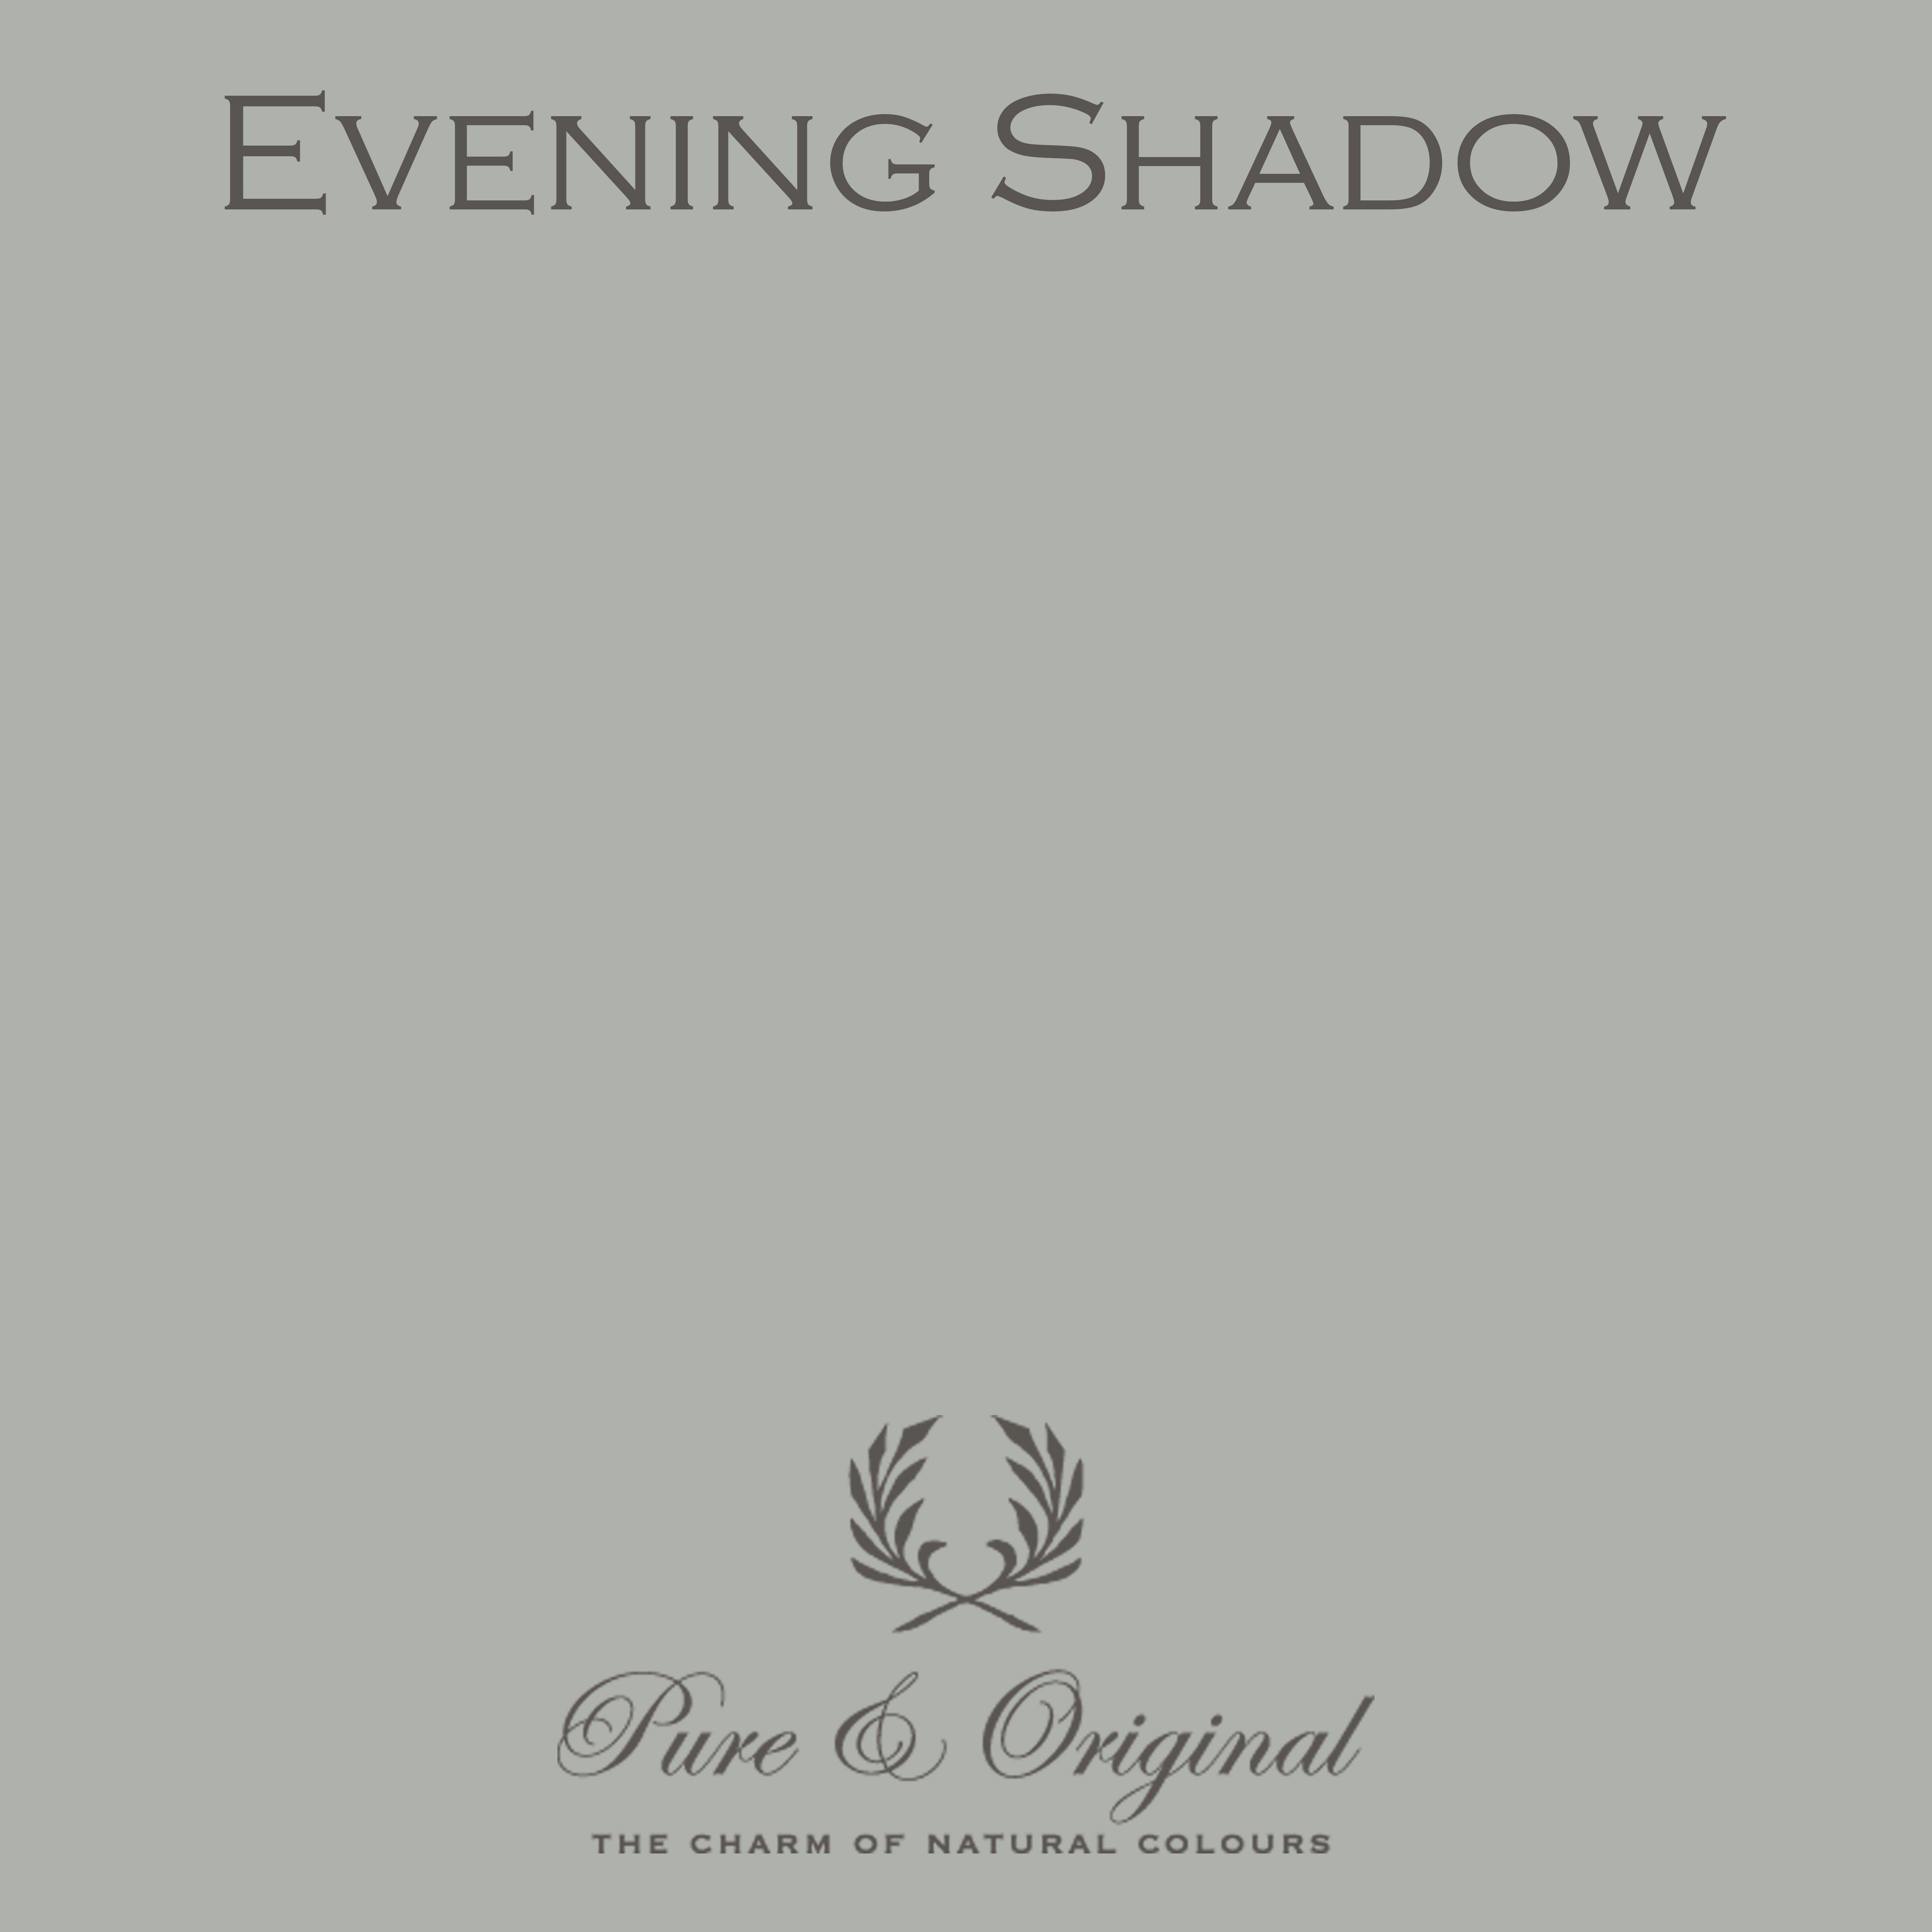 Evening Shadow